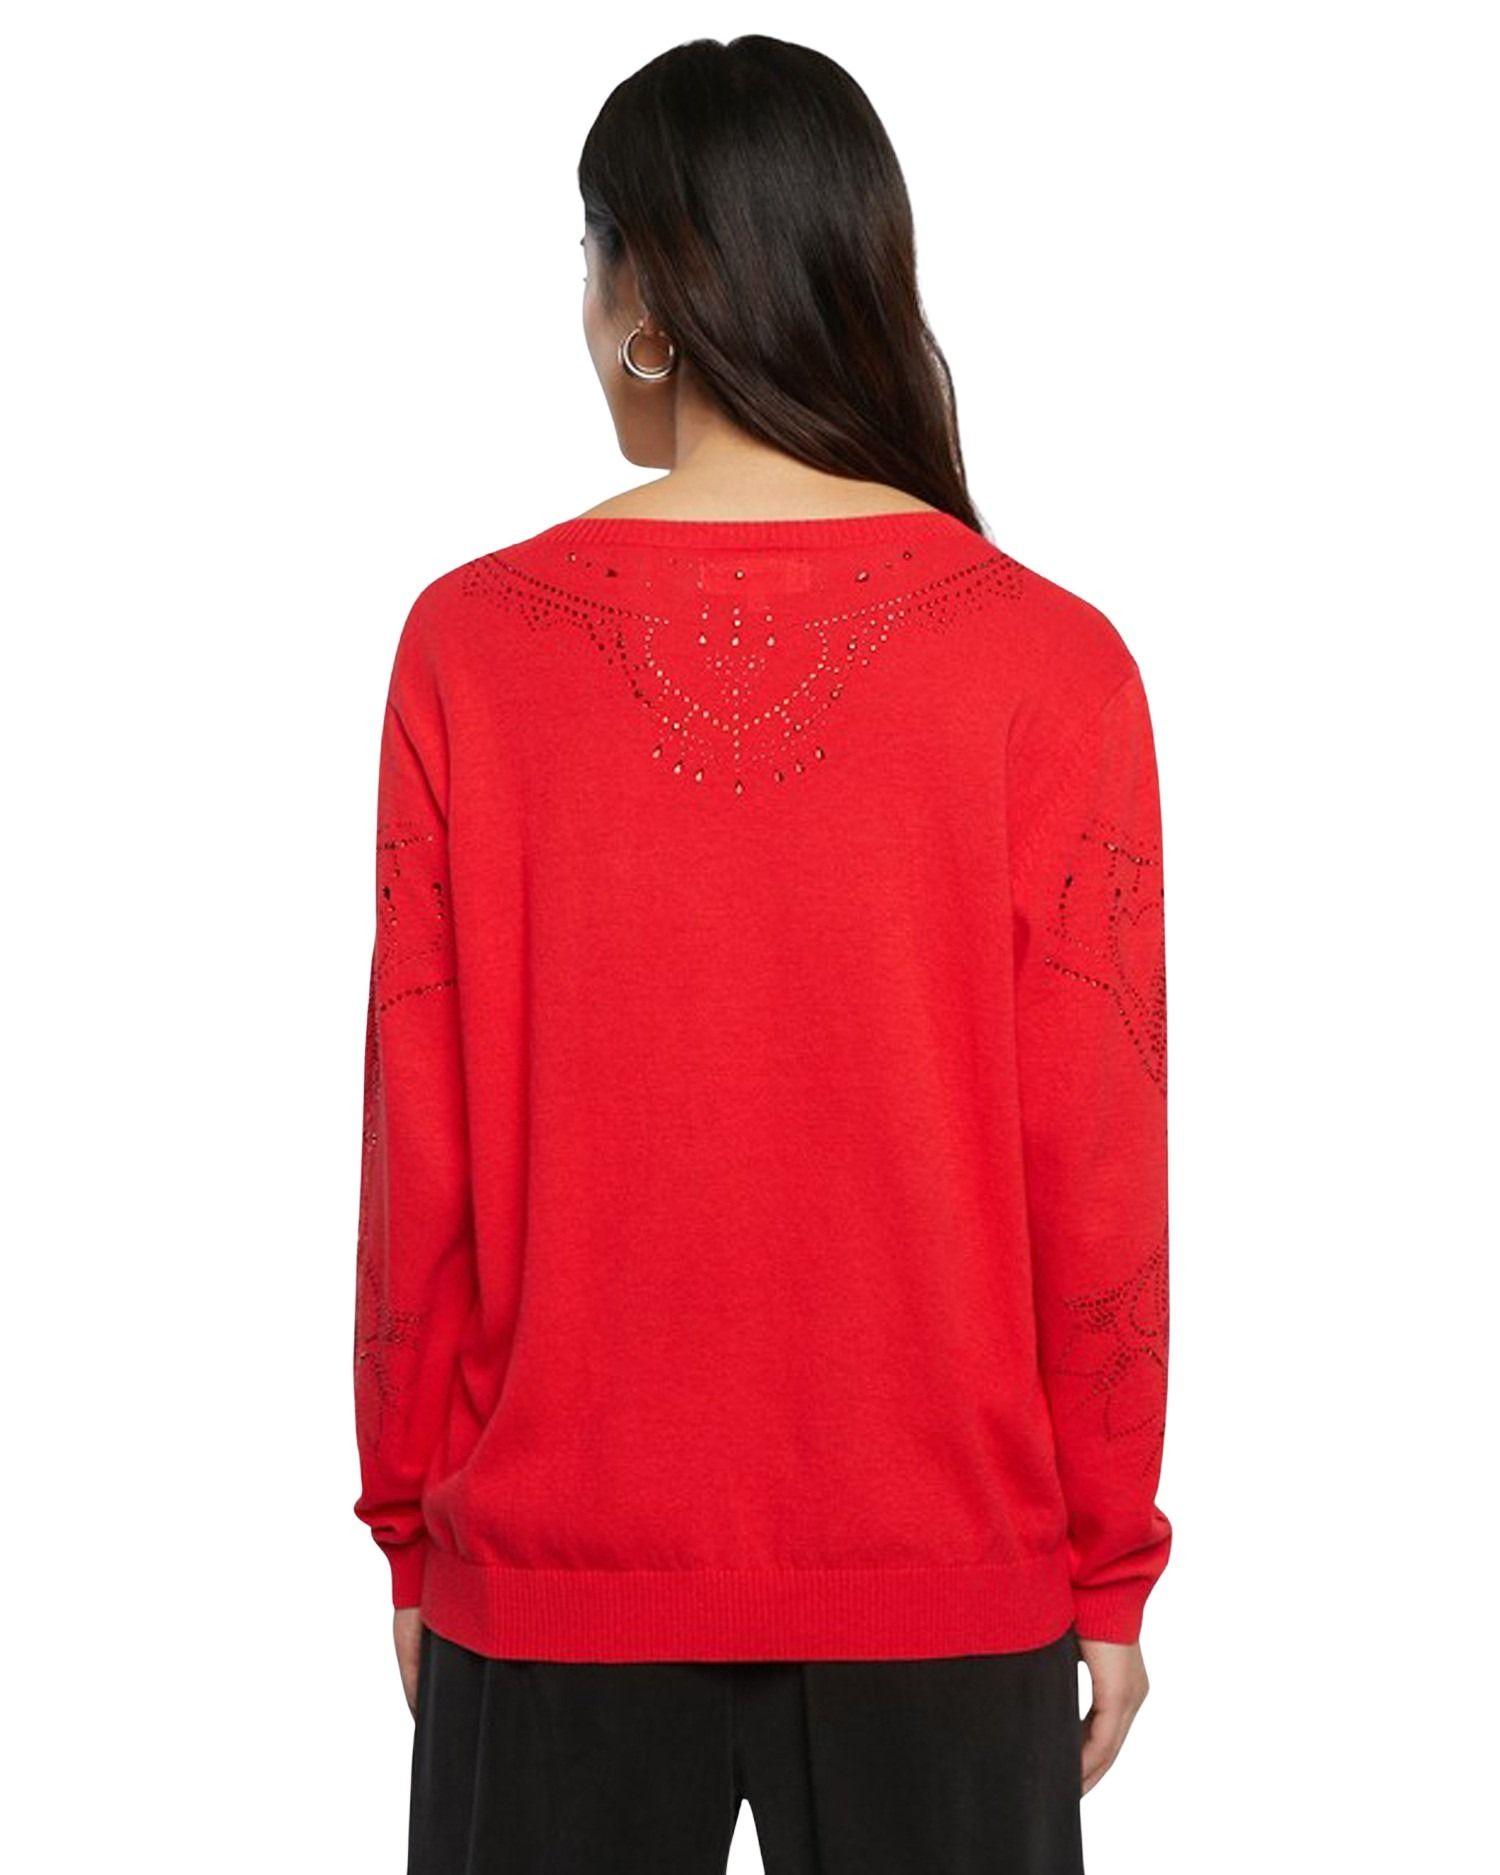 DESIGUAL Cottons DESIGUAL WOMEN'S RED COTTON SWEATER